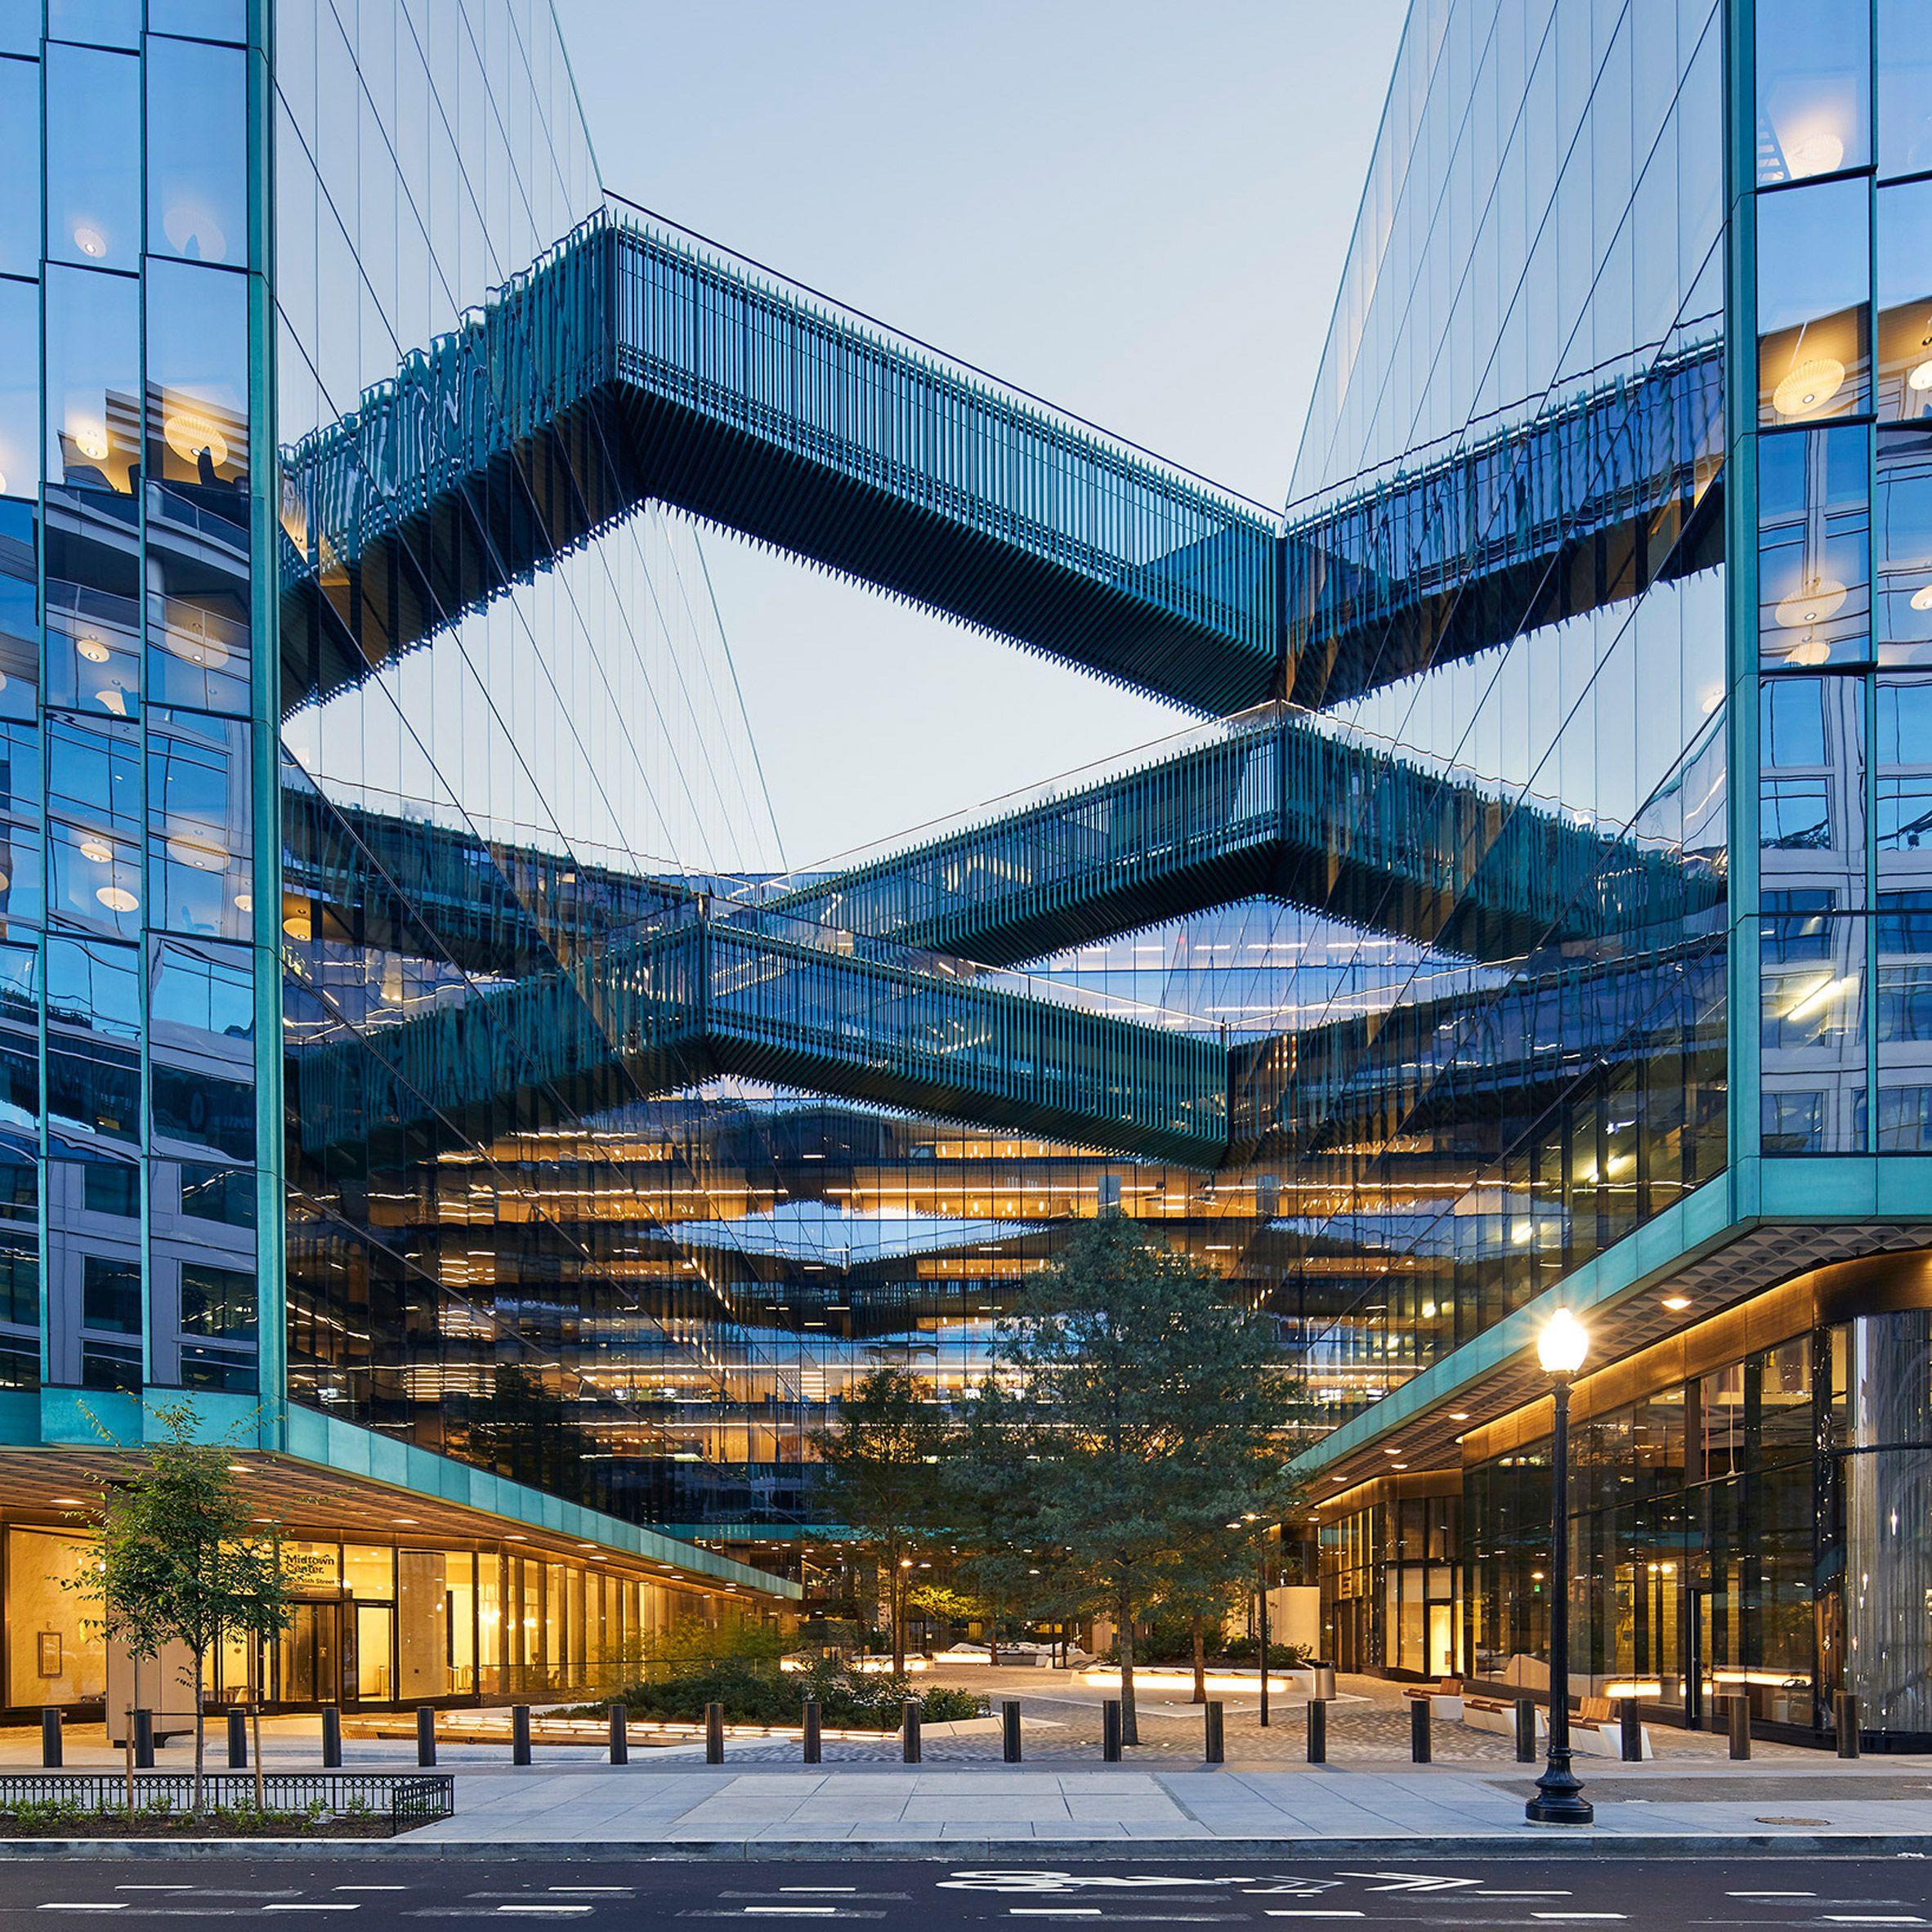 Midtown At Town Center: Sky Bridges Criss-cross SHoP's Midtown Center In